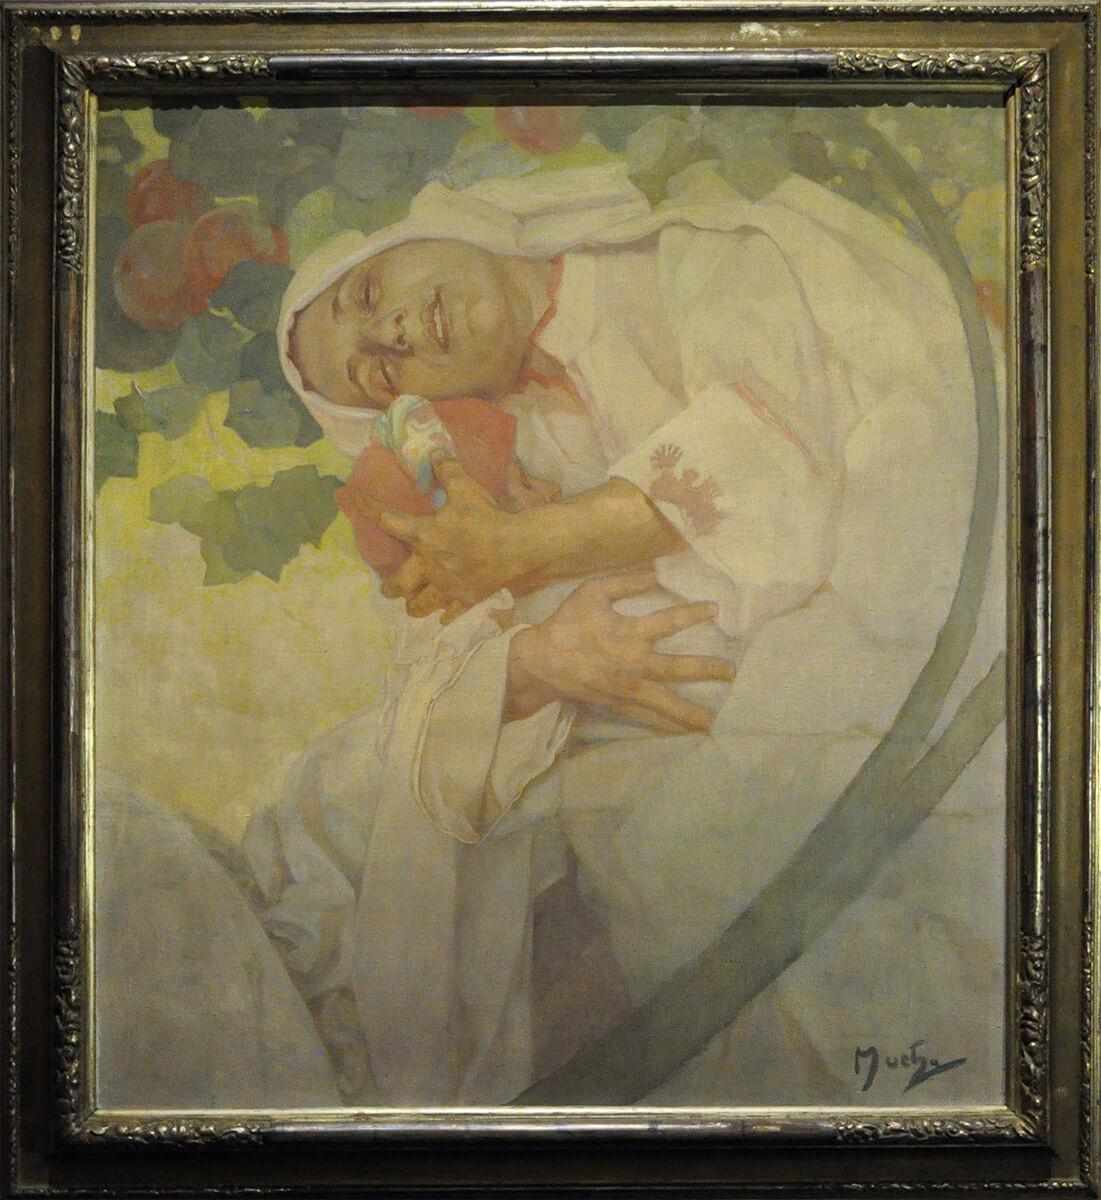 Alfons Mucha. Dreaming, 1897. Richard Fuxa Foundation, foto © Richard Fuxa Foundation